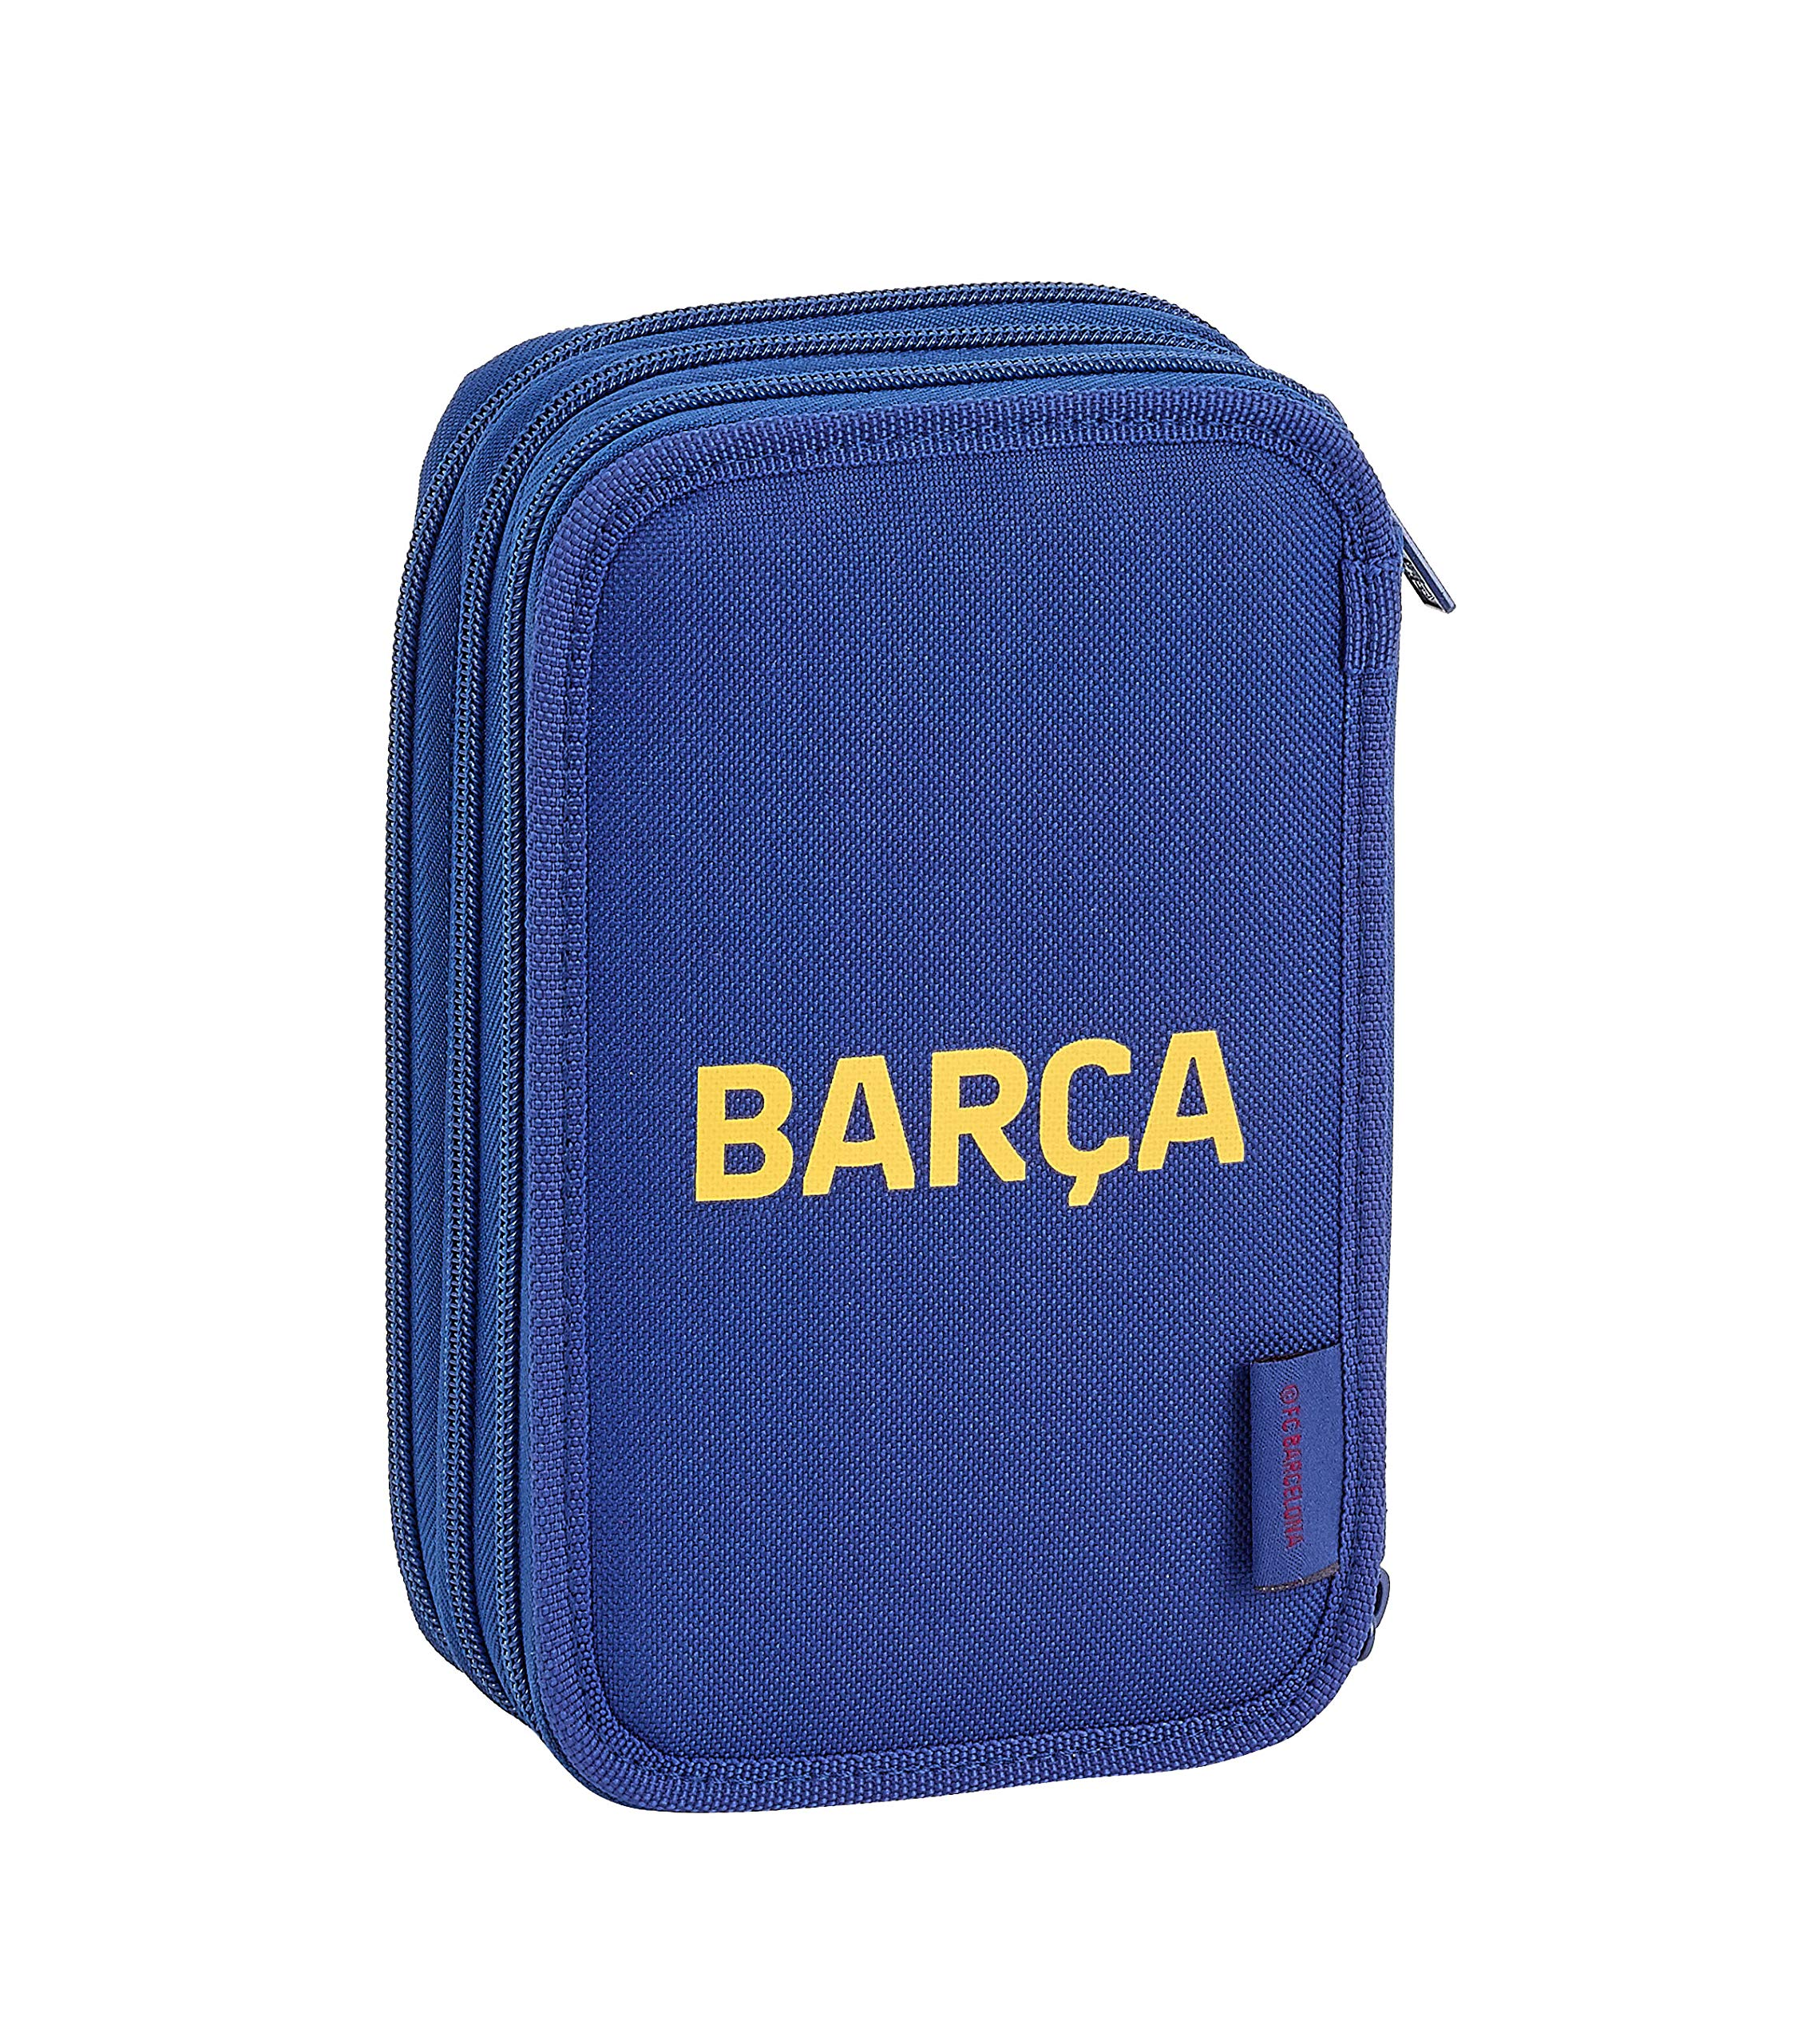 FCB FC Barcelona Estuche, Niños Unisex, Azul Marino, 12.5×20.5×6